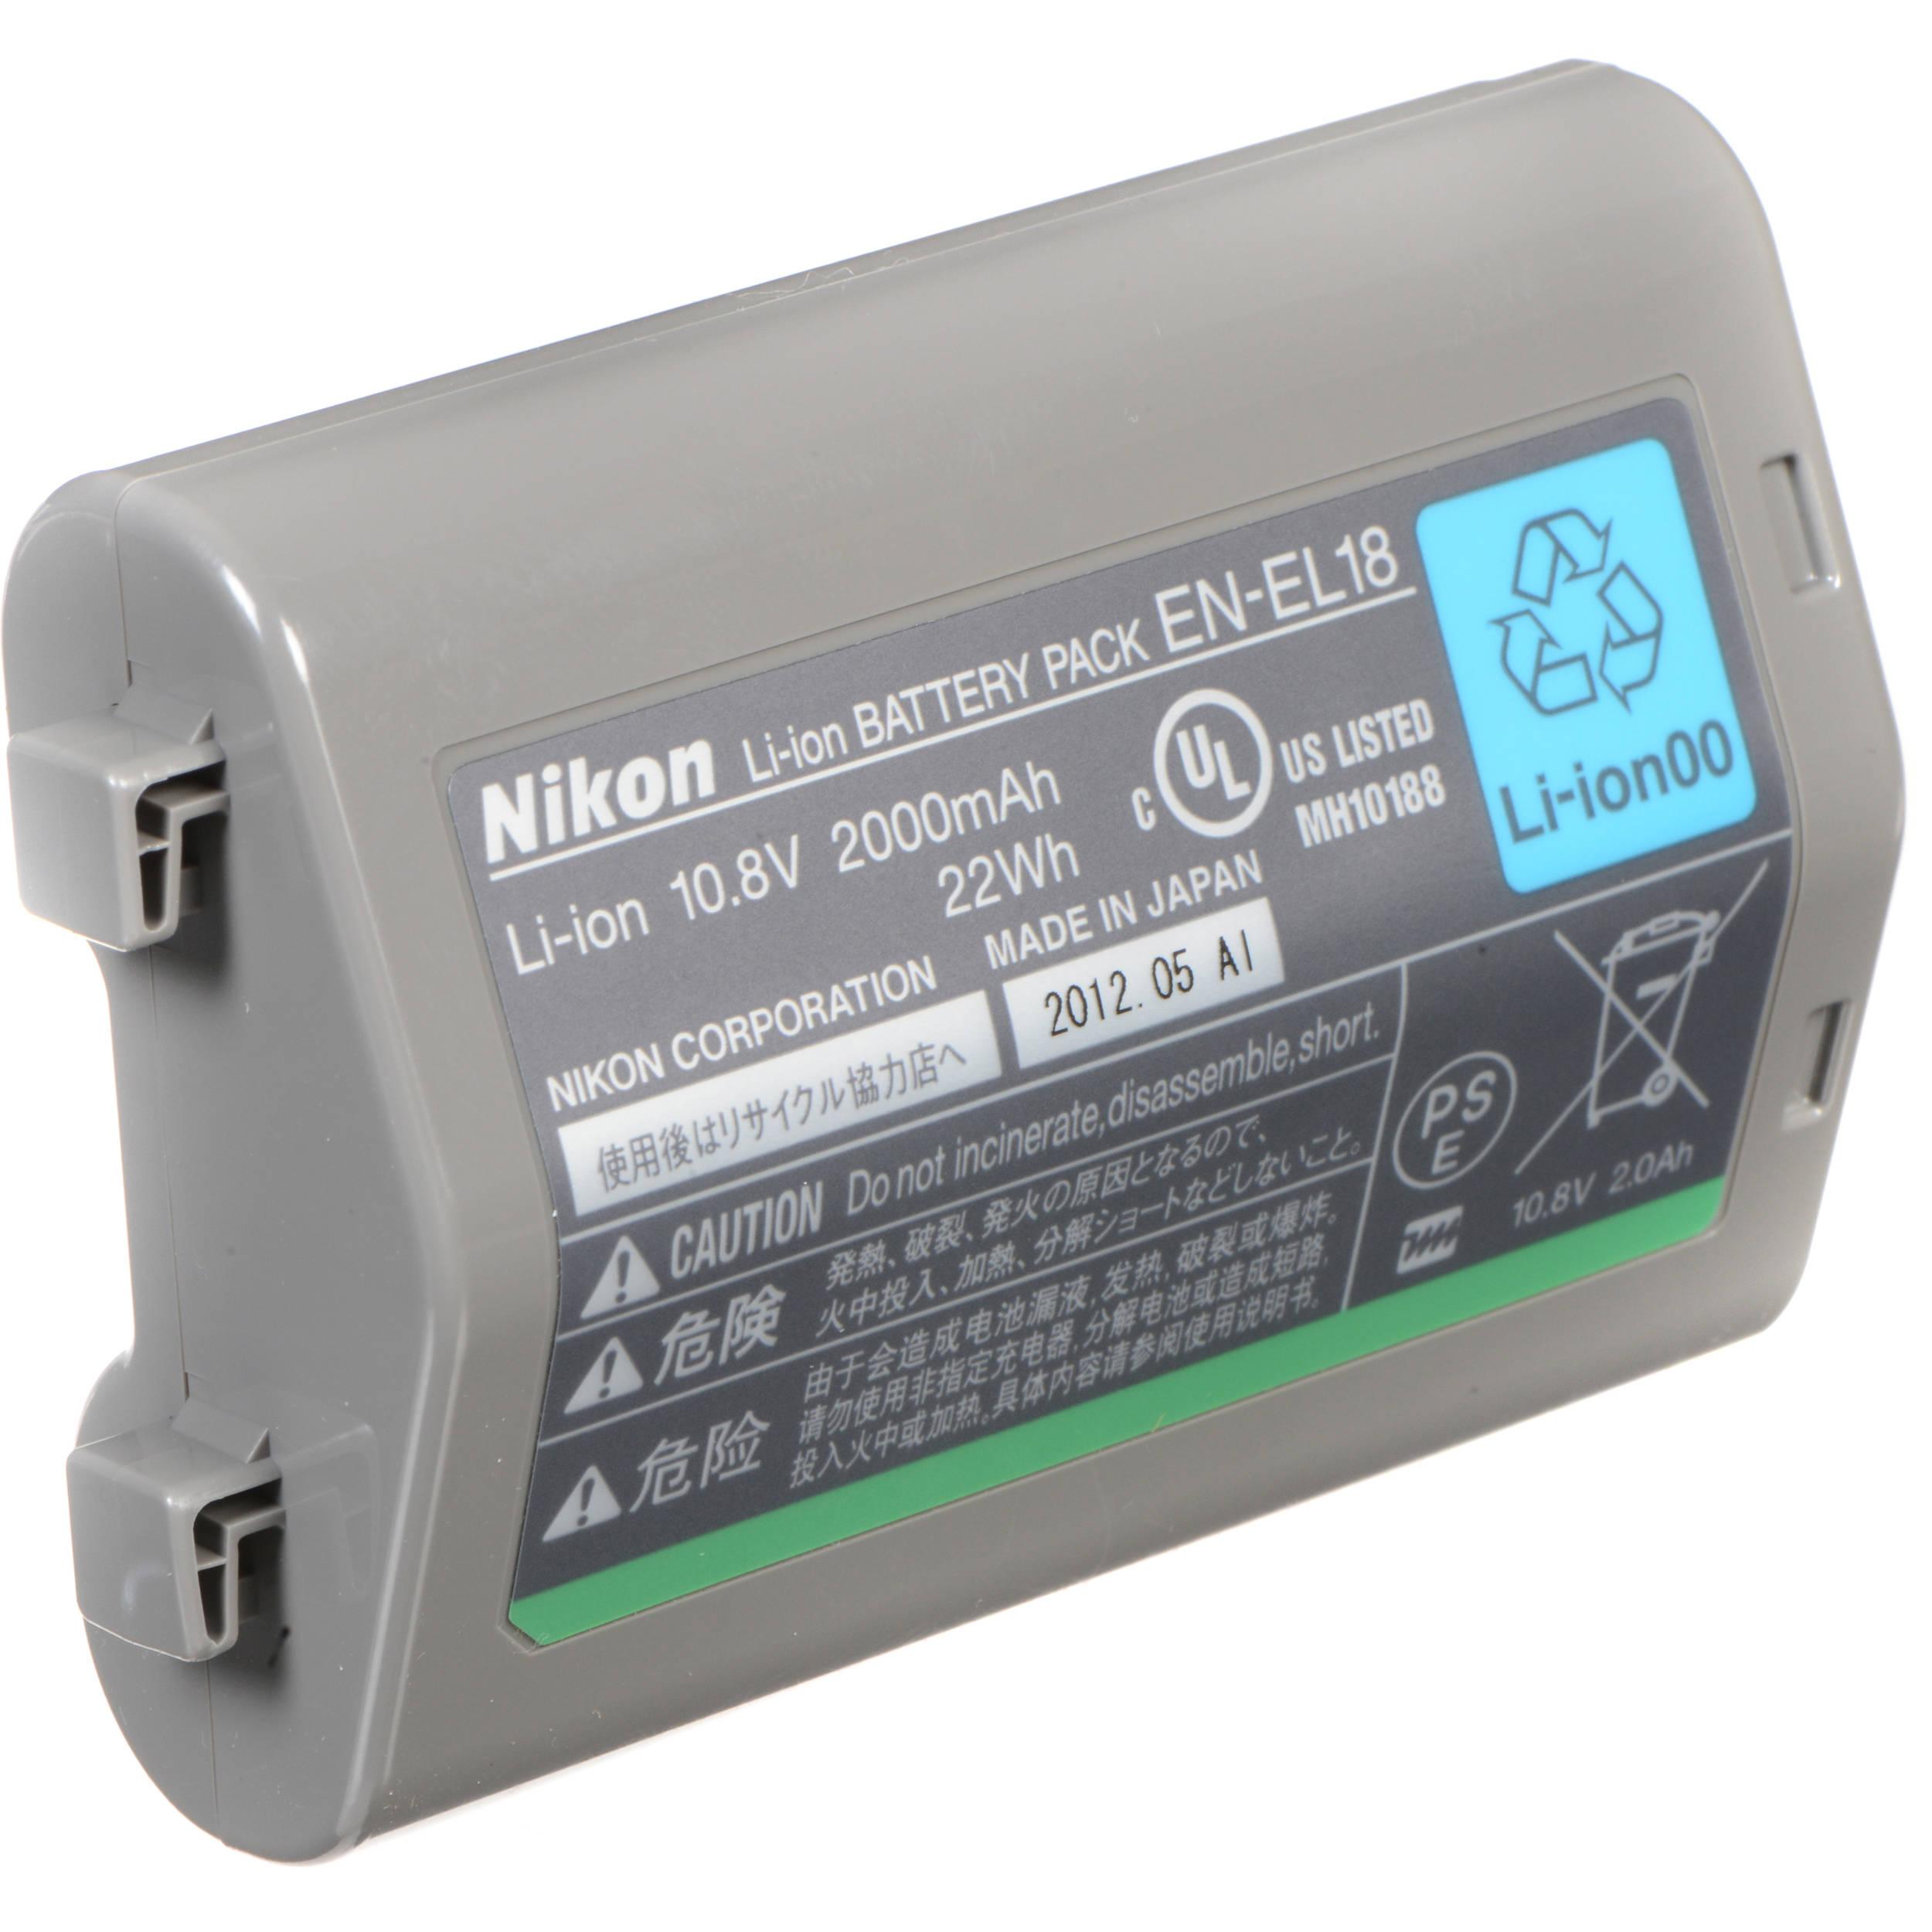 Nikon EN-EL18 Rechargeable Li-ion Battery 27050 B